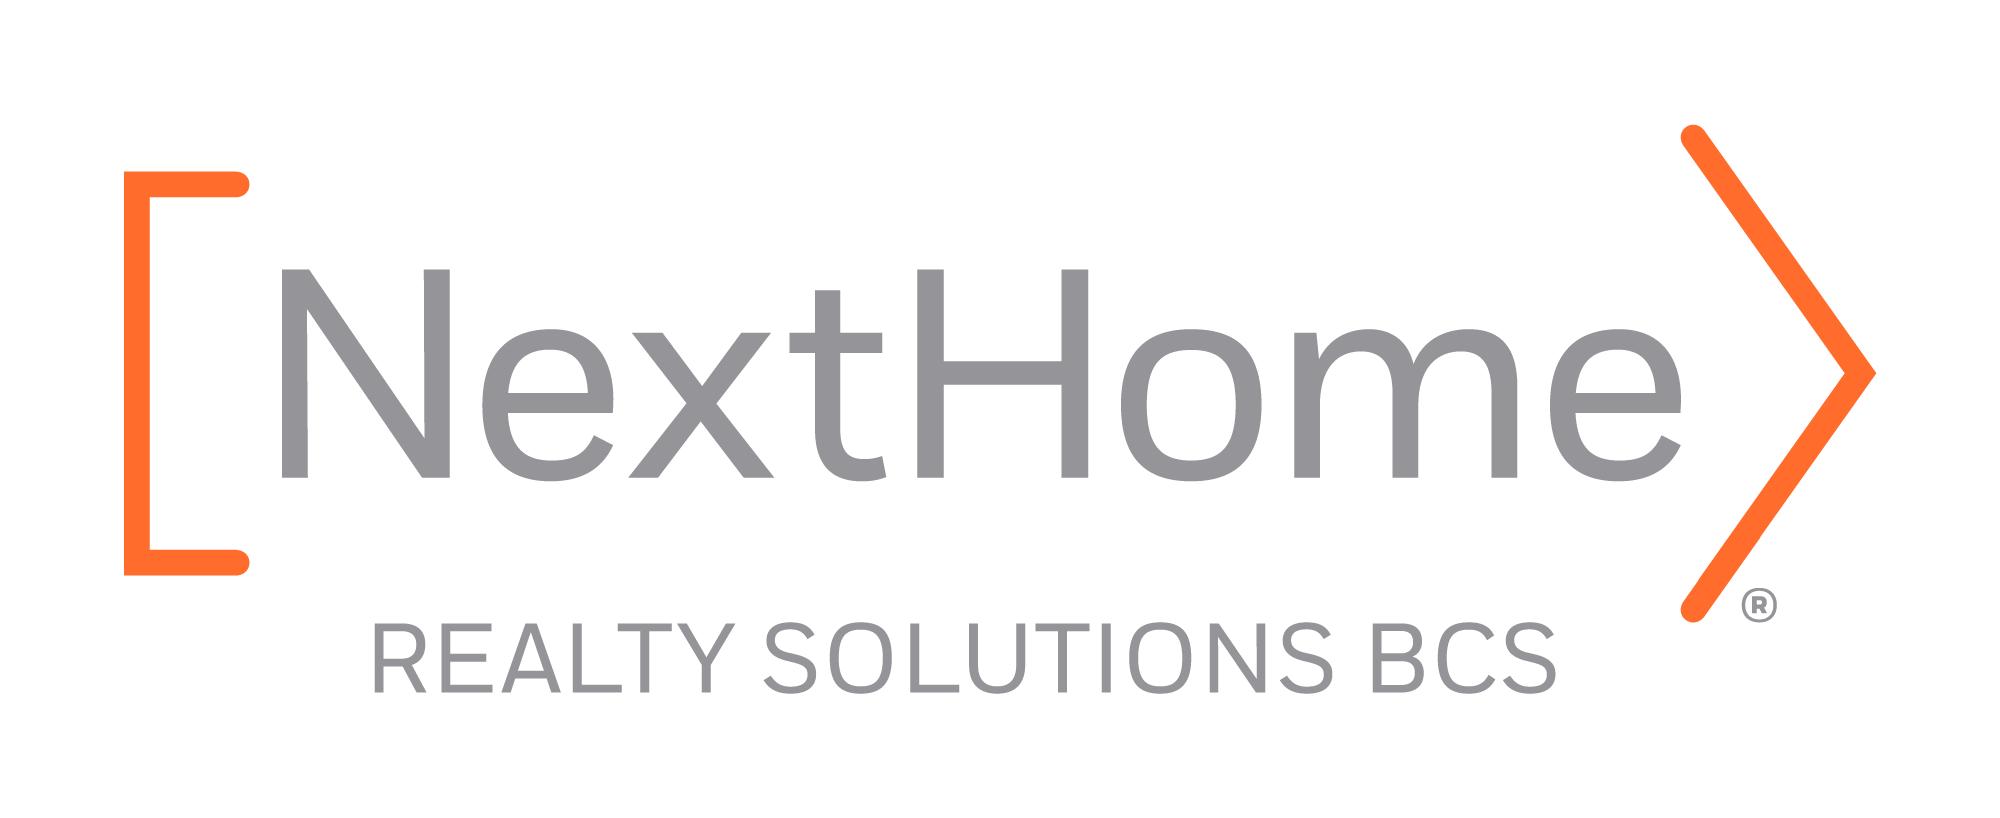 NextHome Realty Solutions BCS Logo